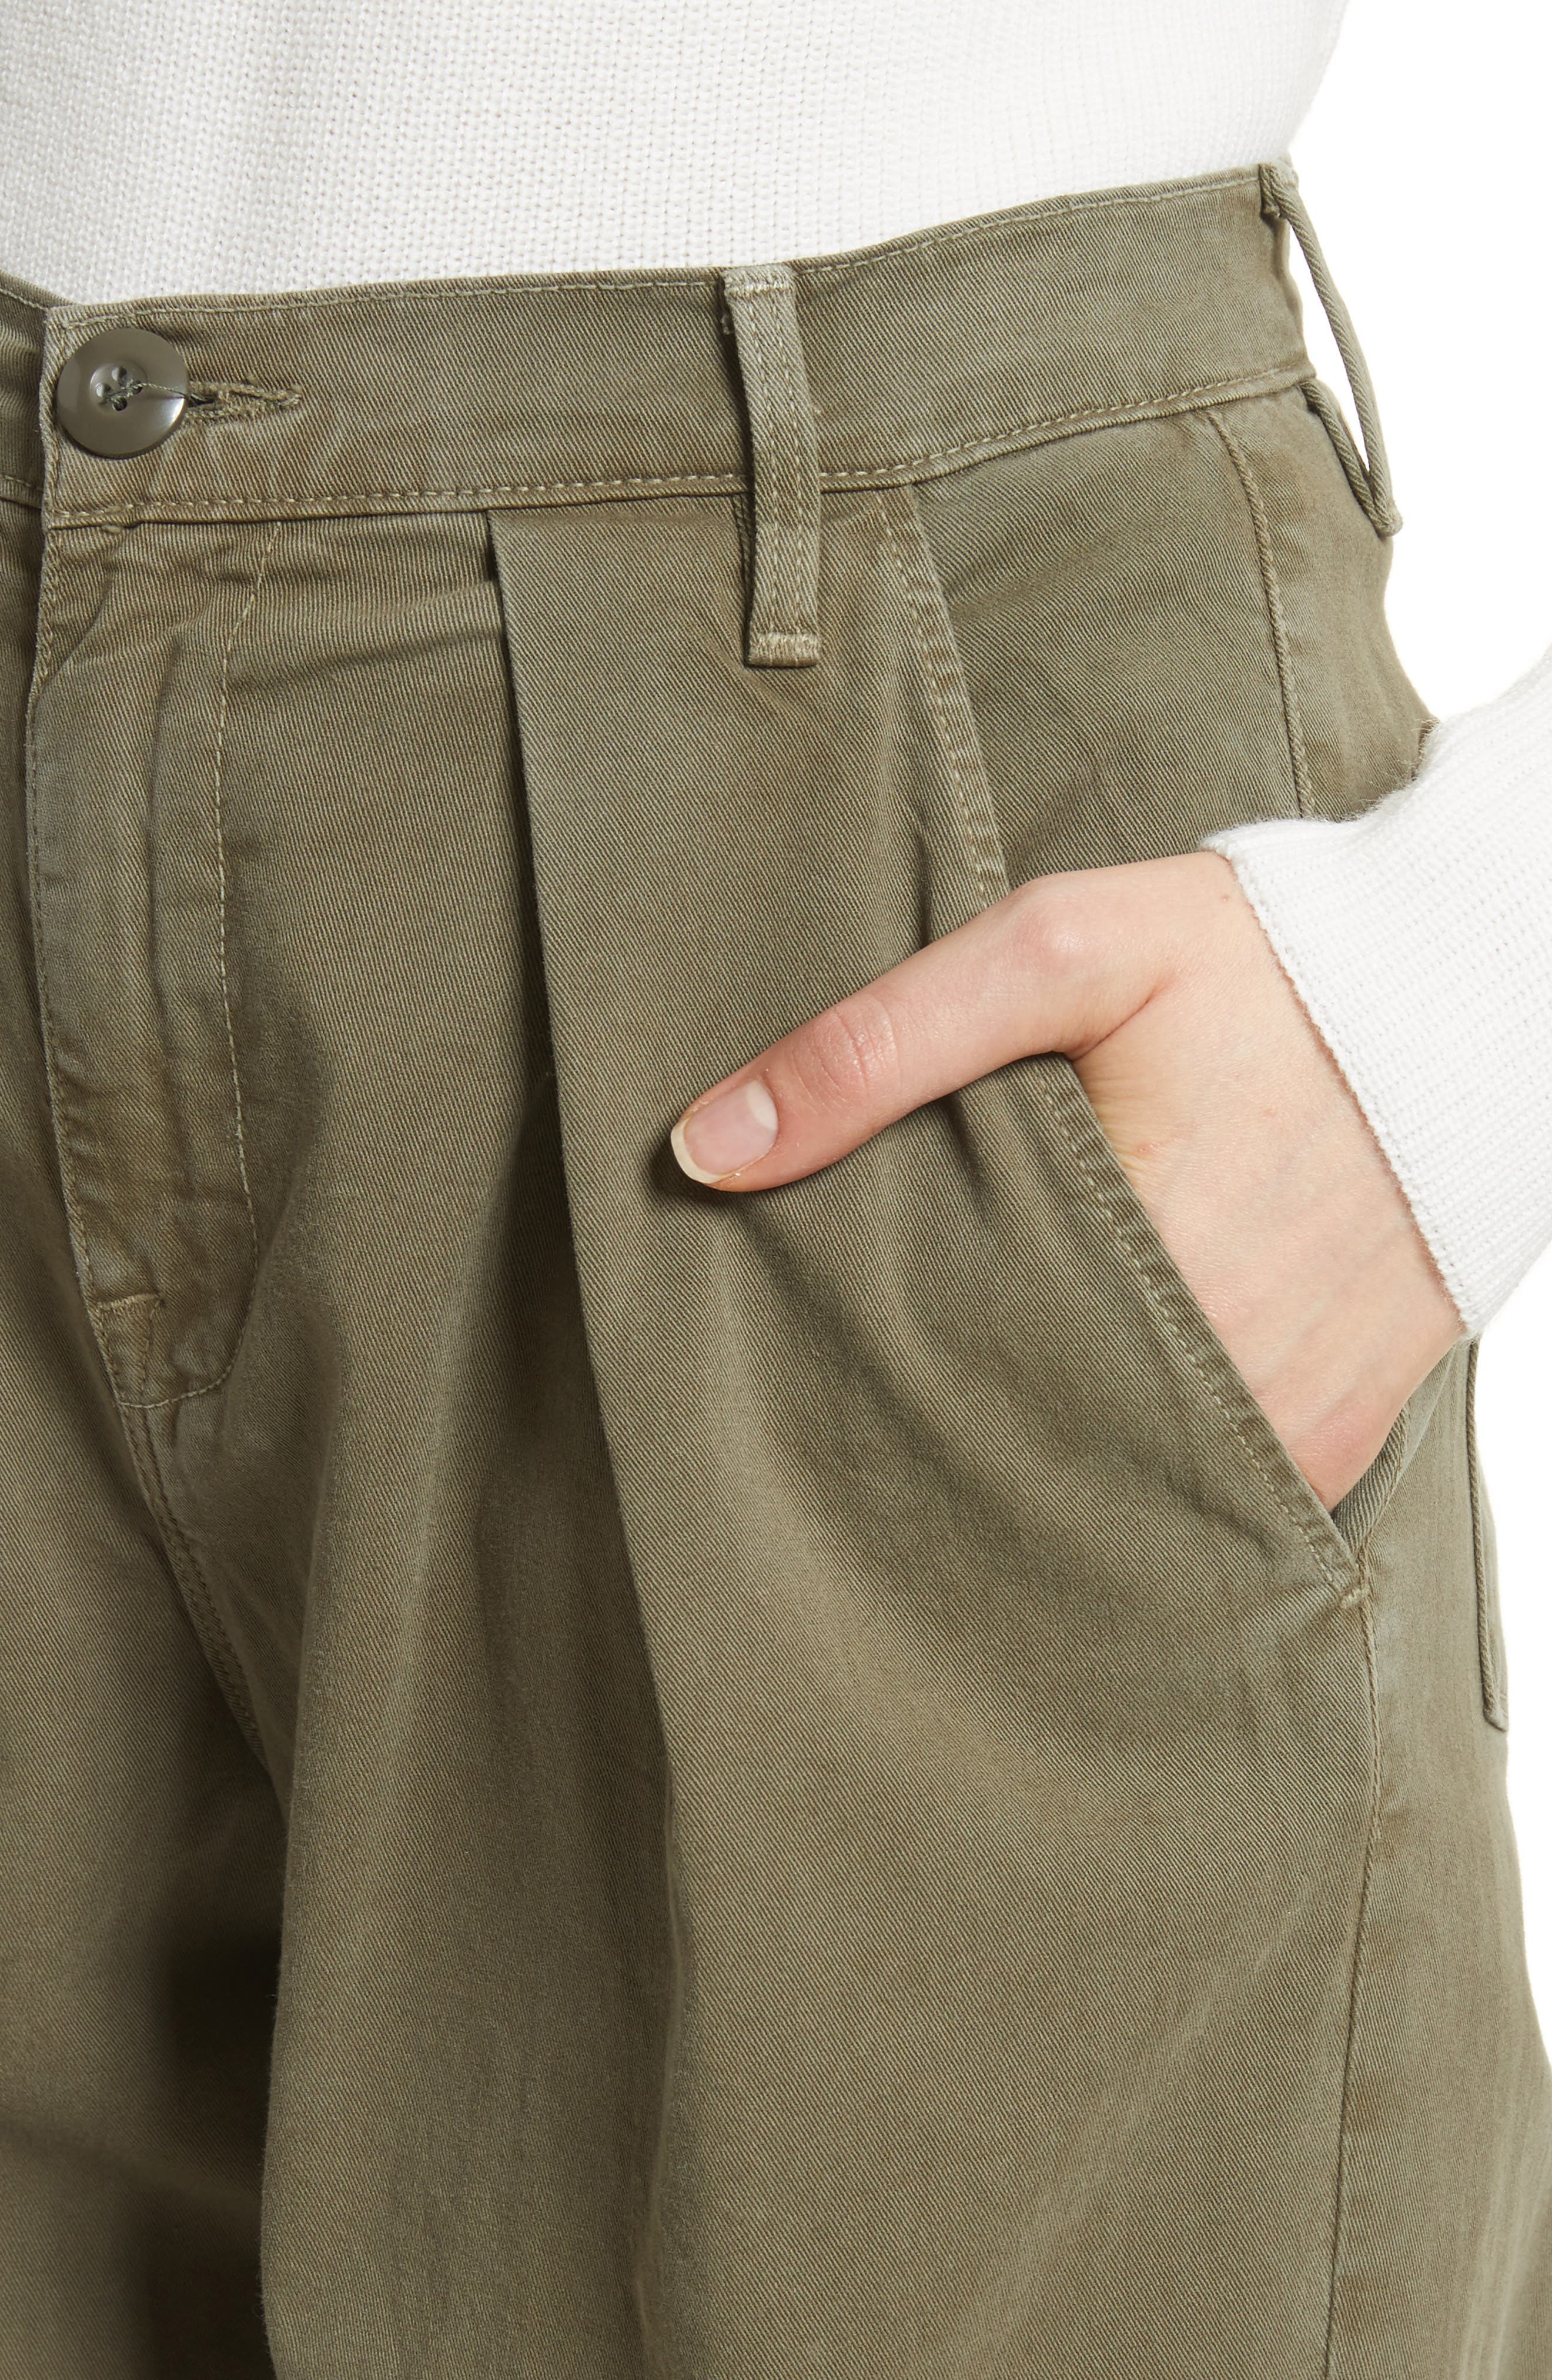 Le Service Wide Leg Pants,                             Alternate thumbnail 4, color,                             Militia Green